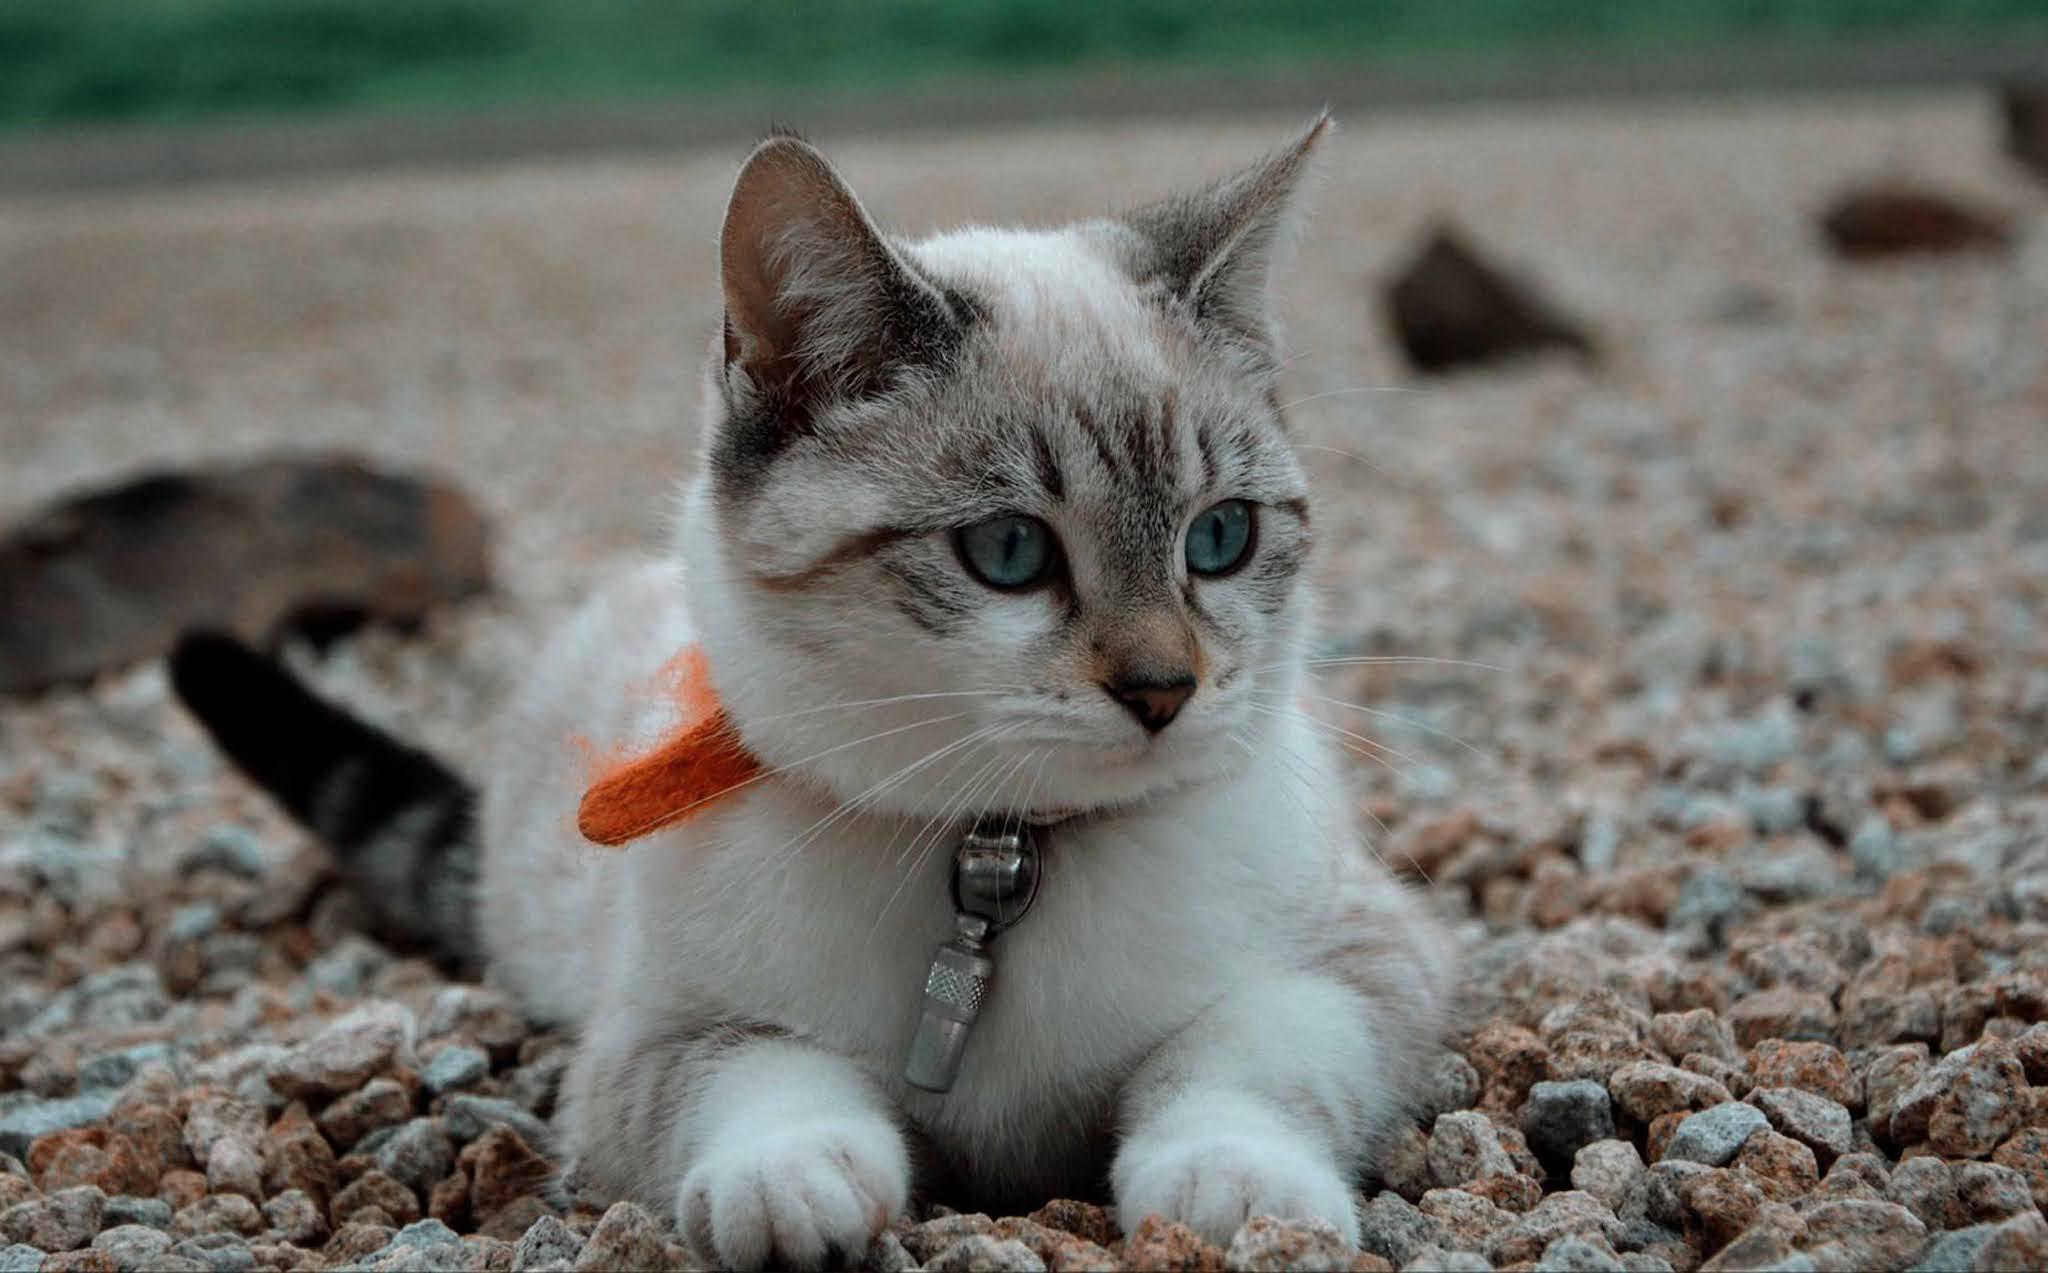 21 wallpaper image kitten, cat, glance, cute wallpaper, background Ultra HD 4K Desktop Computer